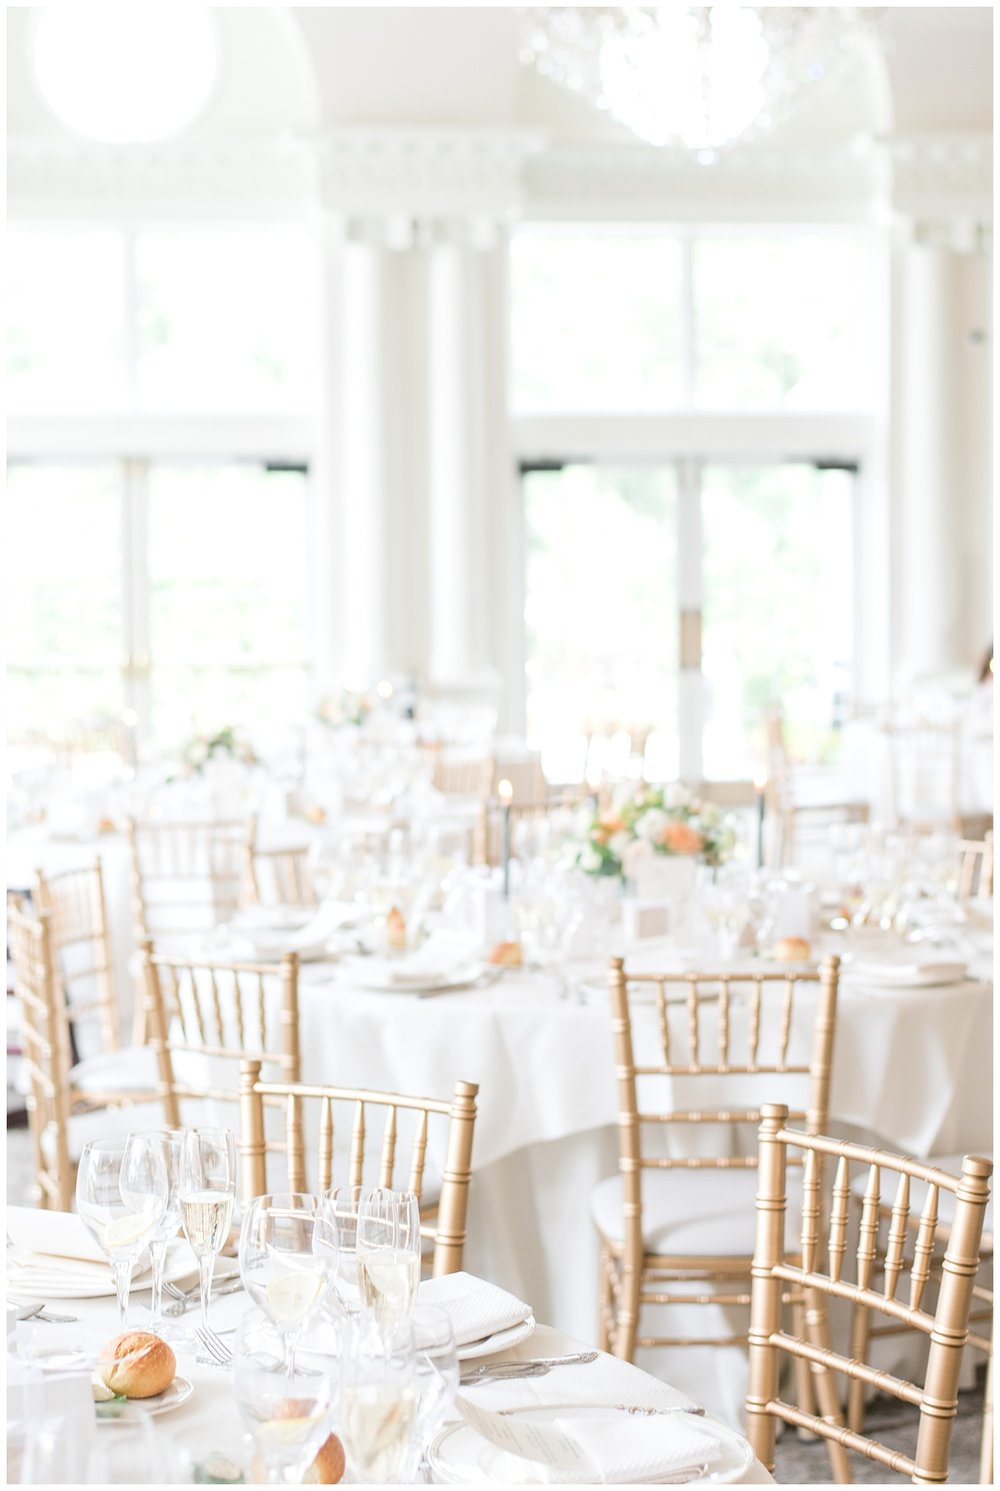 park-chateau-wedding-fabiana-skubic-photography (48).jpg